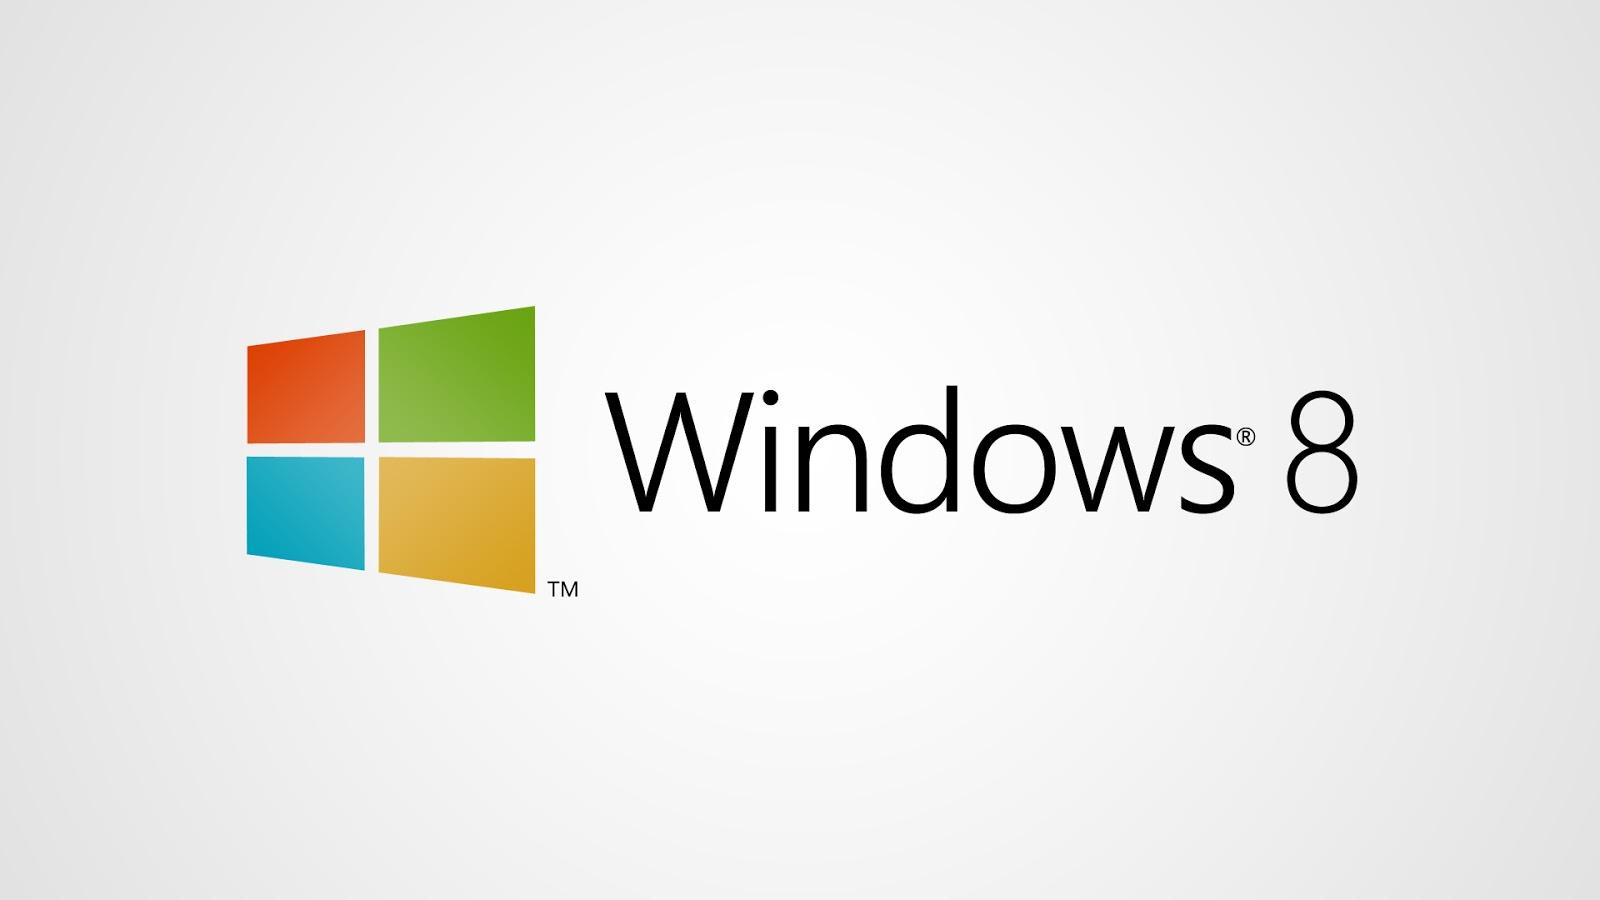 Logo Windows 8: Windows 8 Full HD Wallpapers 1080p